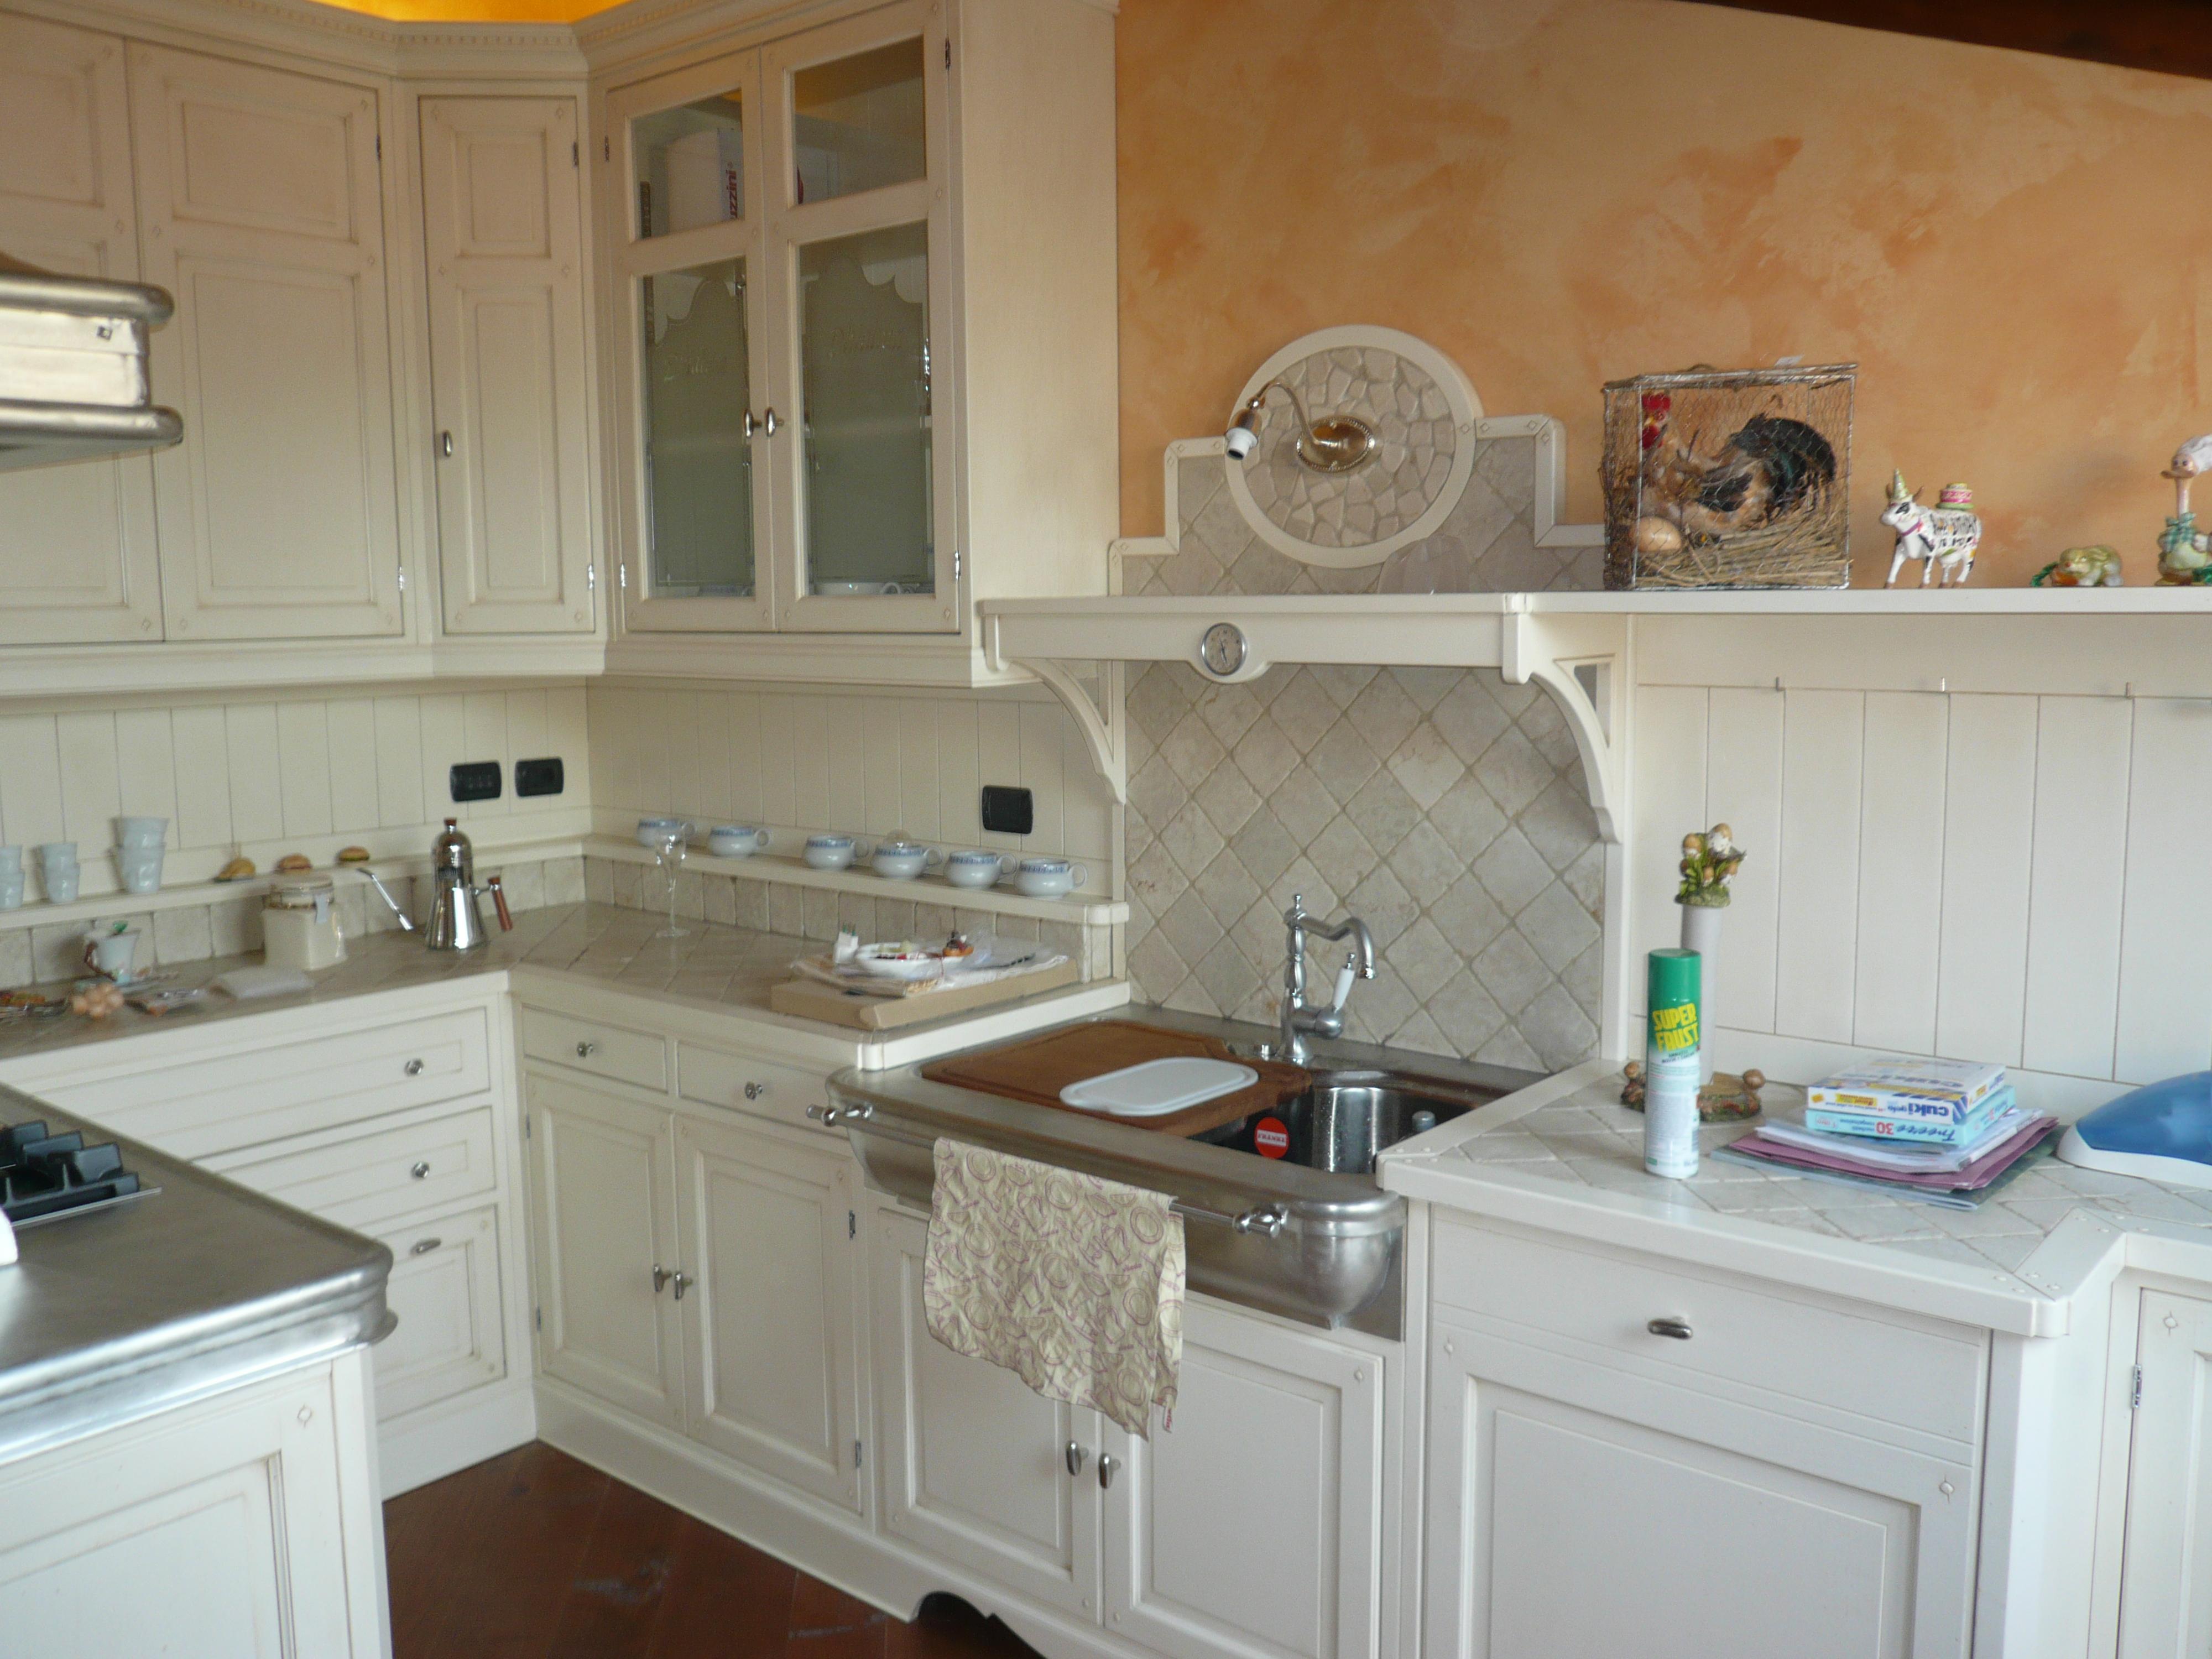 Cucina Dhialma - Marchi cucine